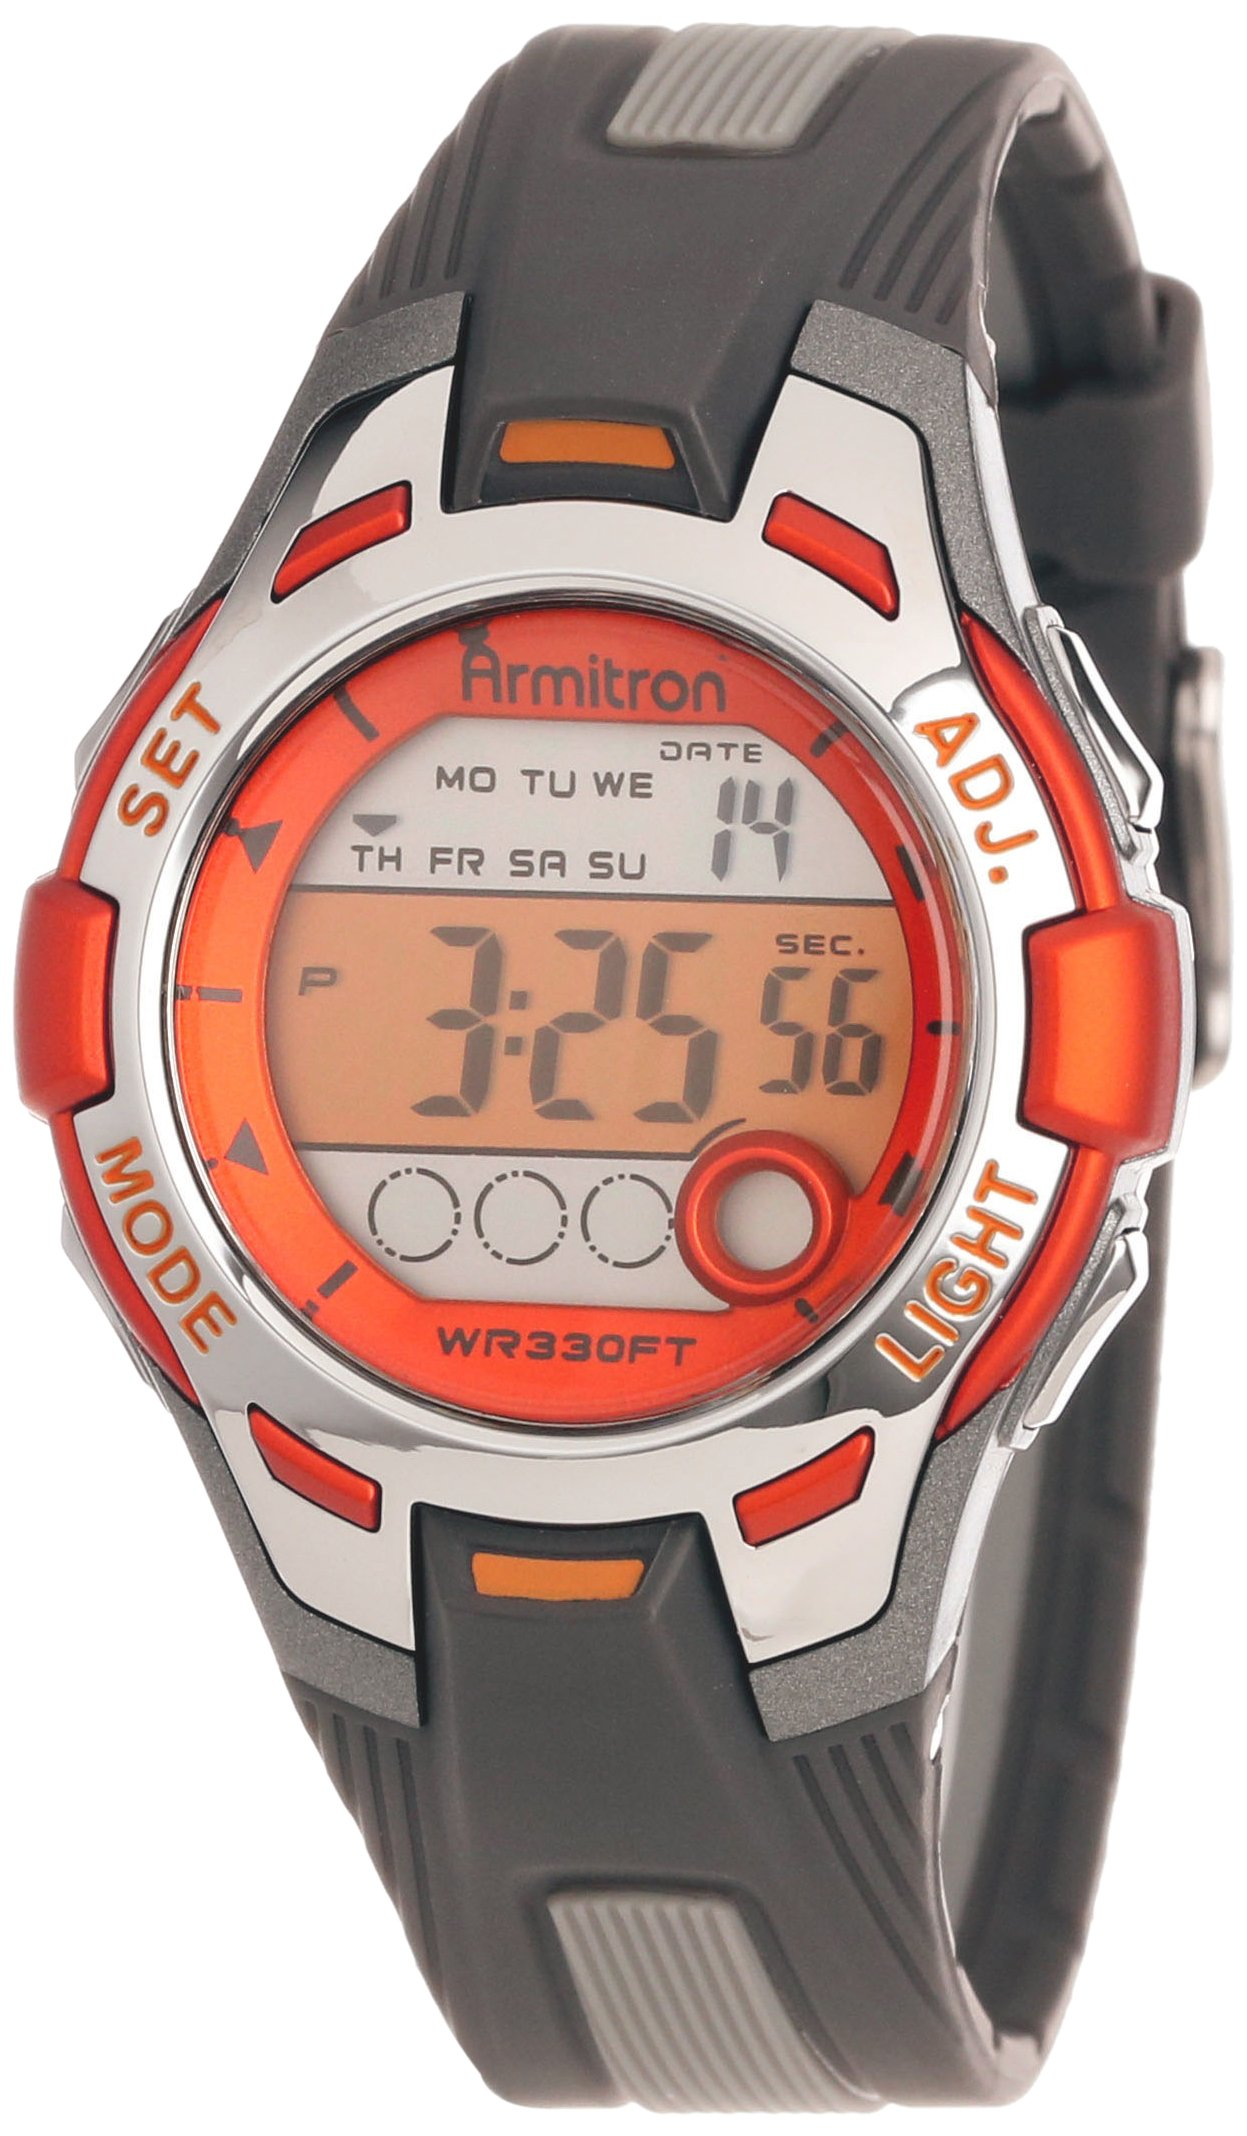 Armitron Sport Women's 45/7030ORG Orange Accented Grey Resin Digital Chronograph Watch by Armitron Sport (Image #1)